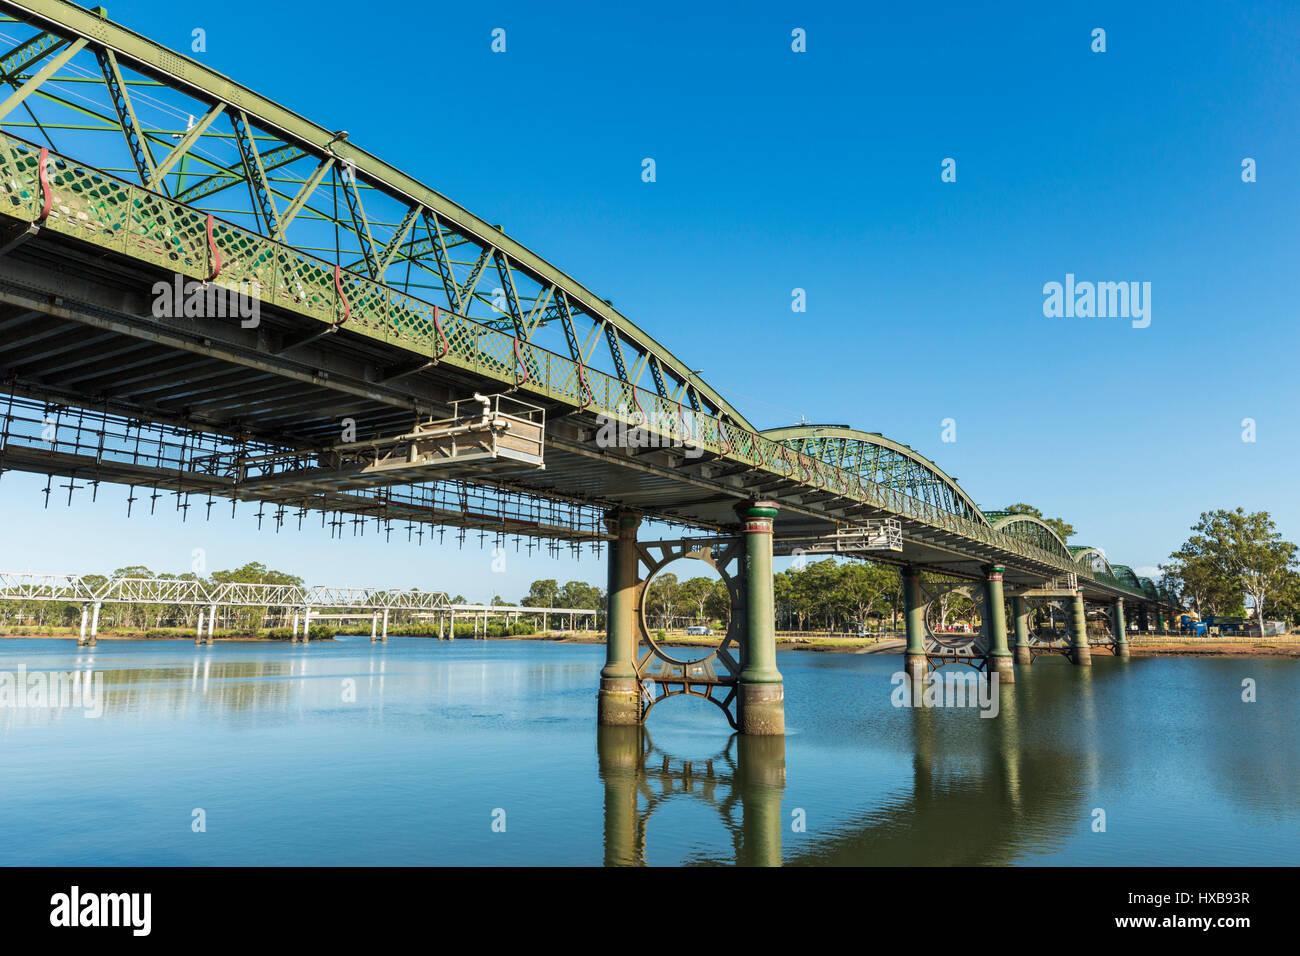 Die denkmalgeschützte Burnett-Brücke.  Bundaberg, Queensland, Australien Stockbild